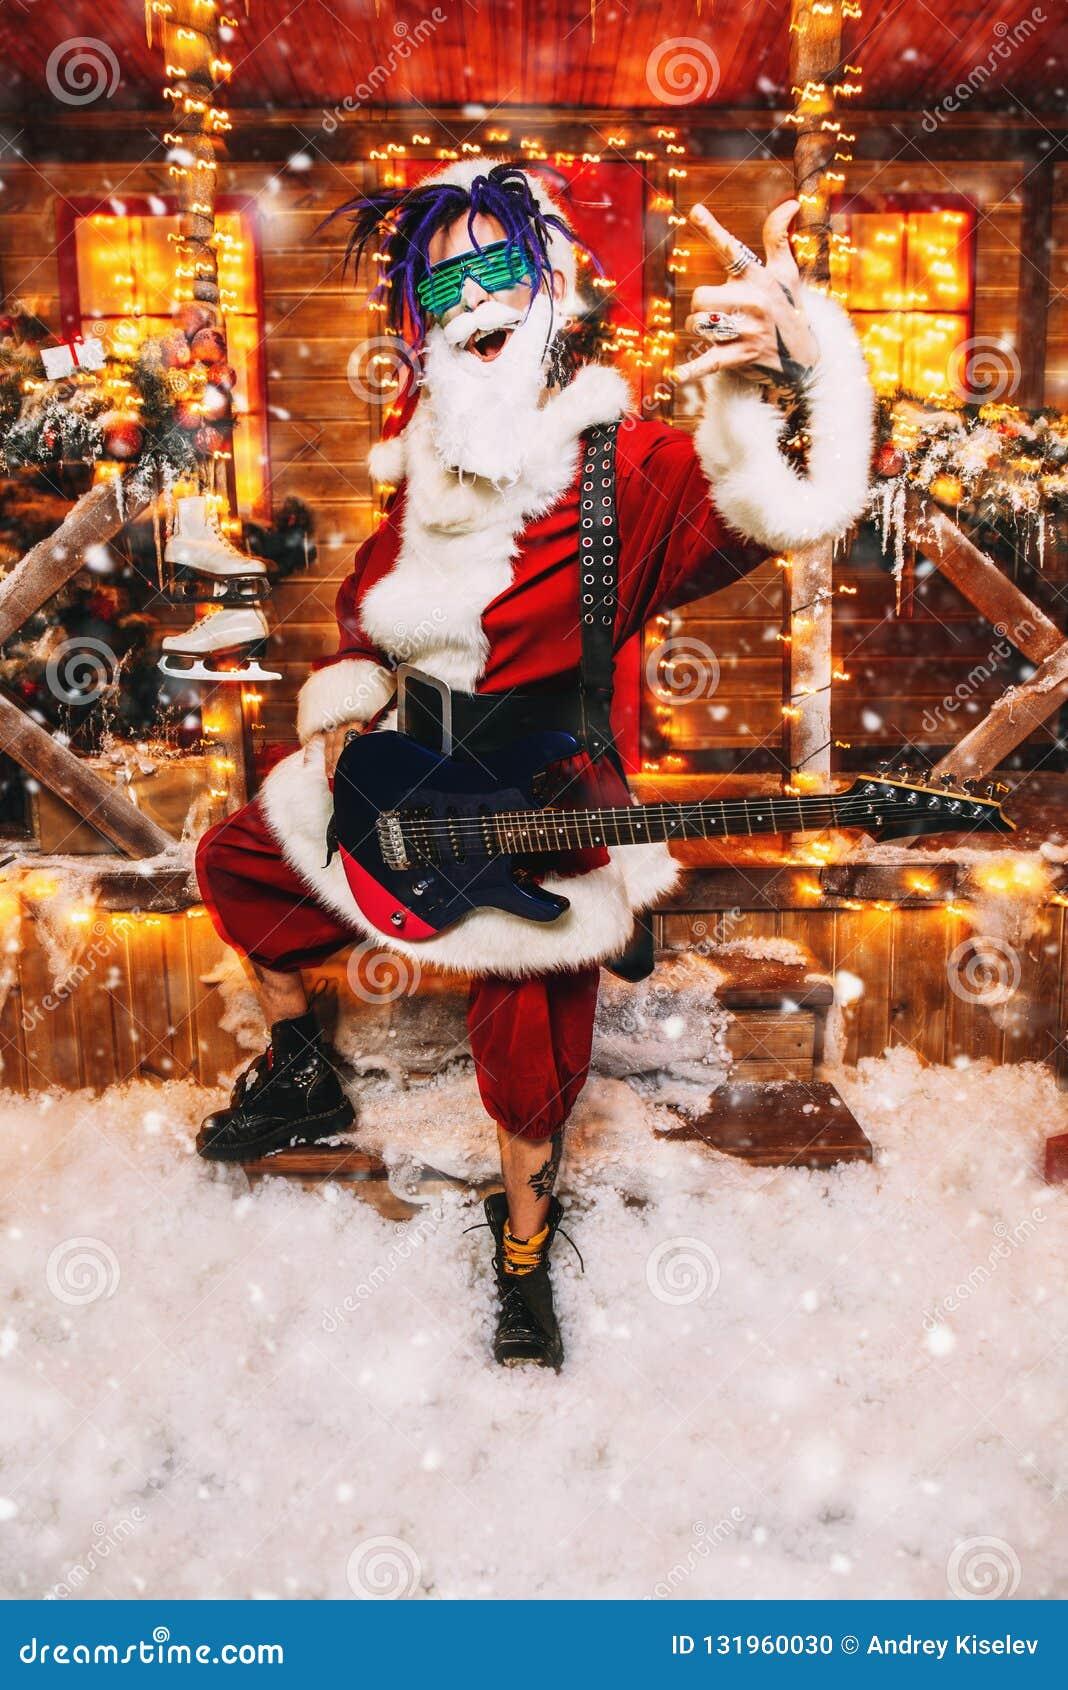 Playing the guitar for christmas